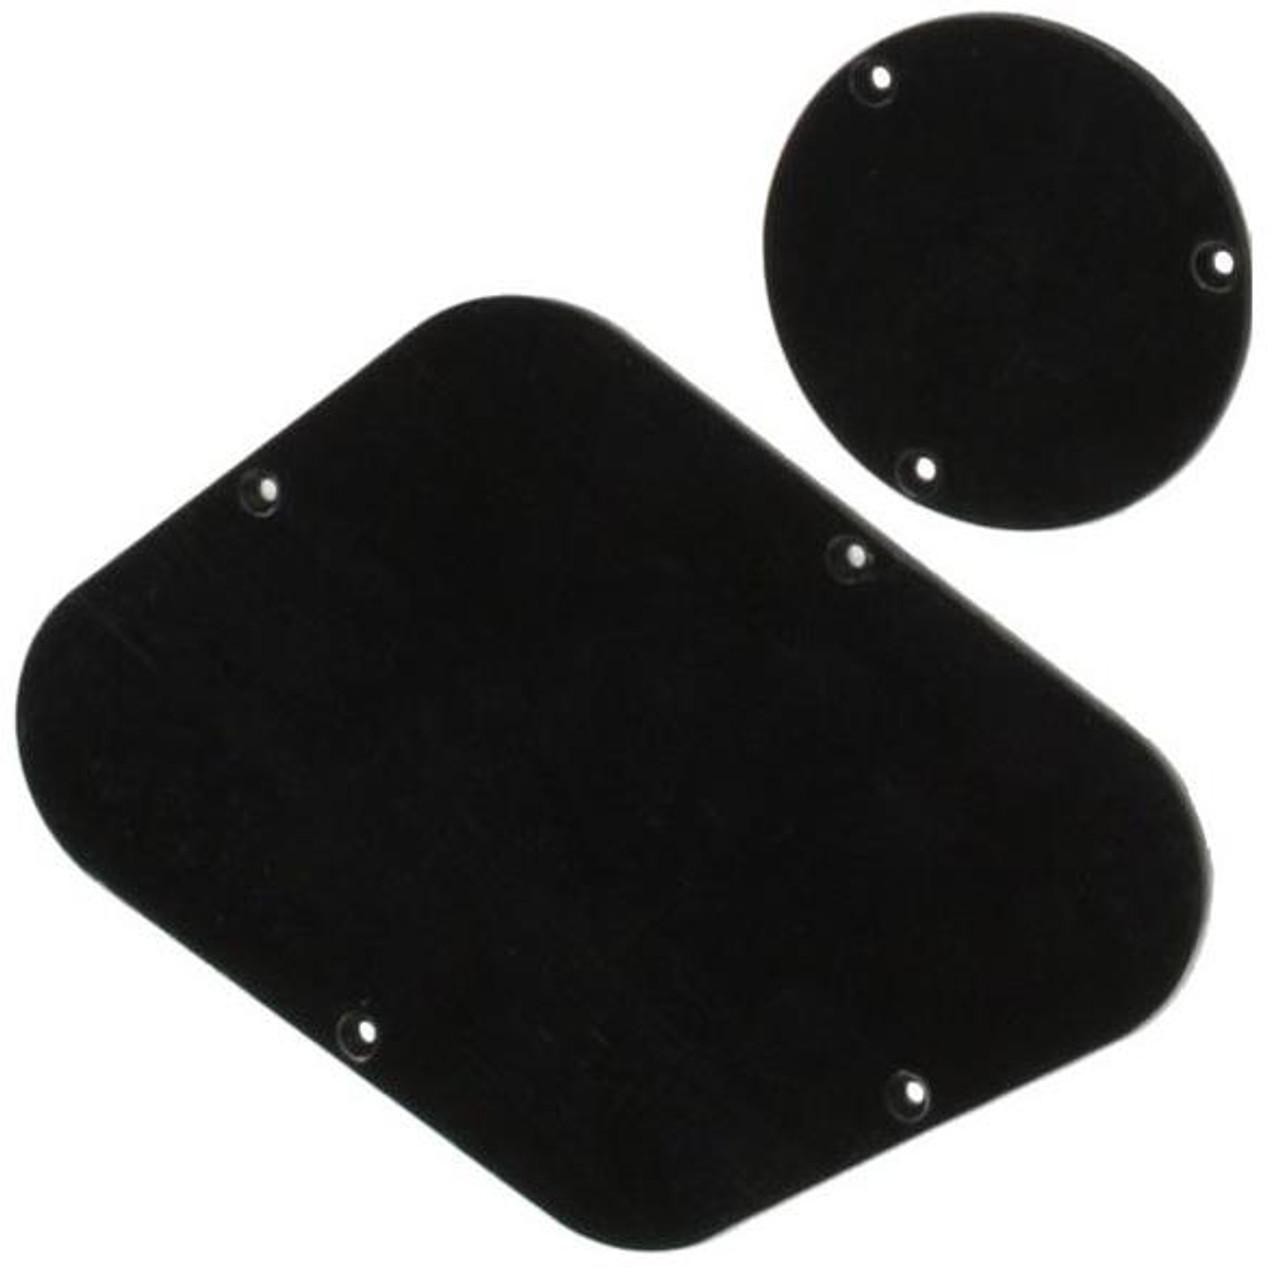 Les Paul Back Plate & Switch Cover Set-Black